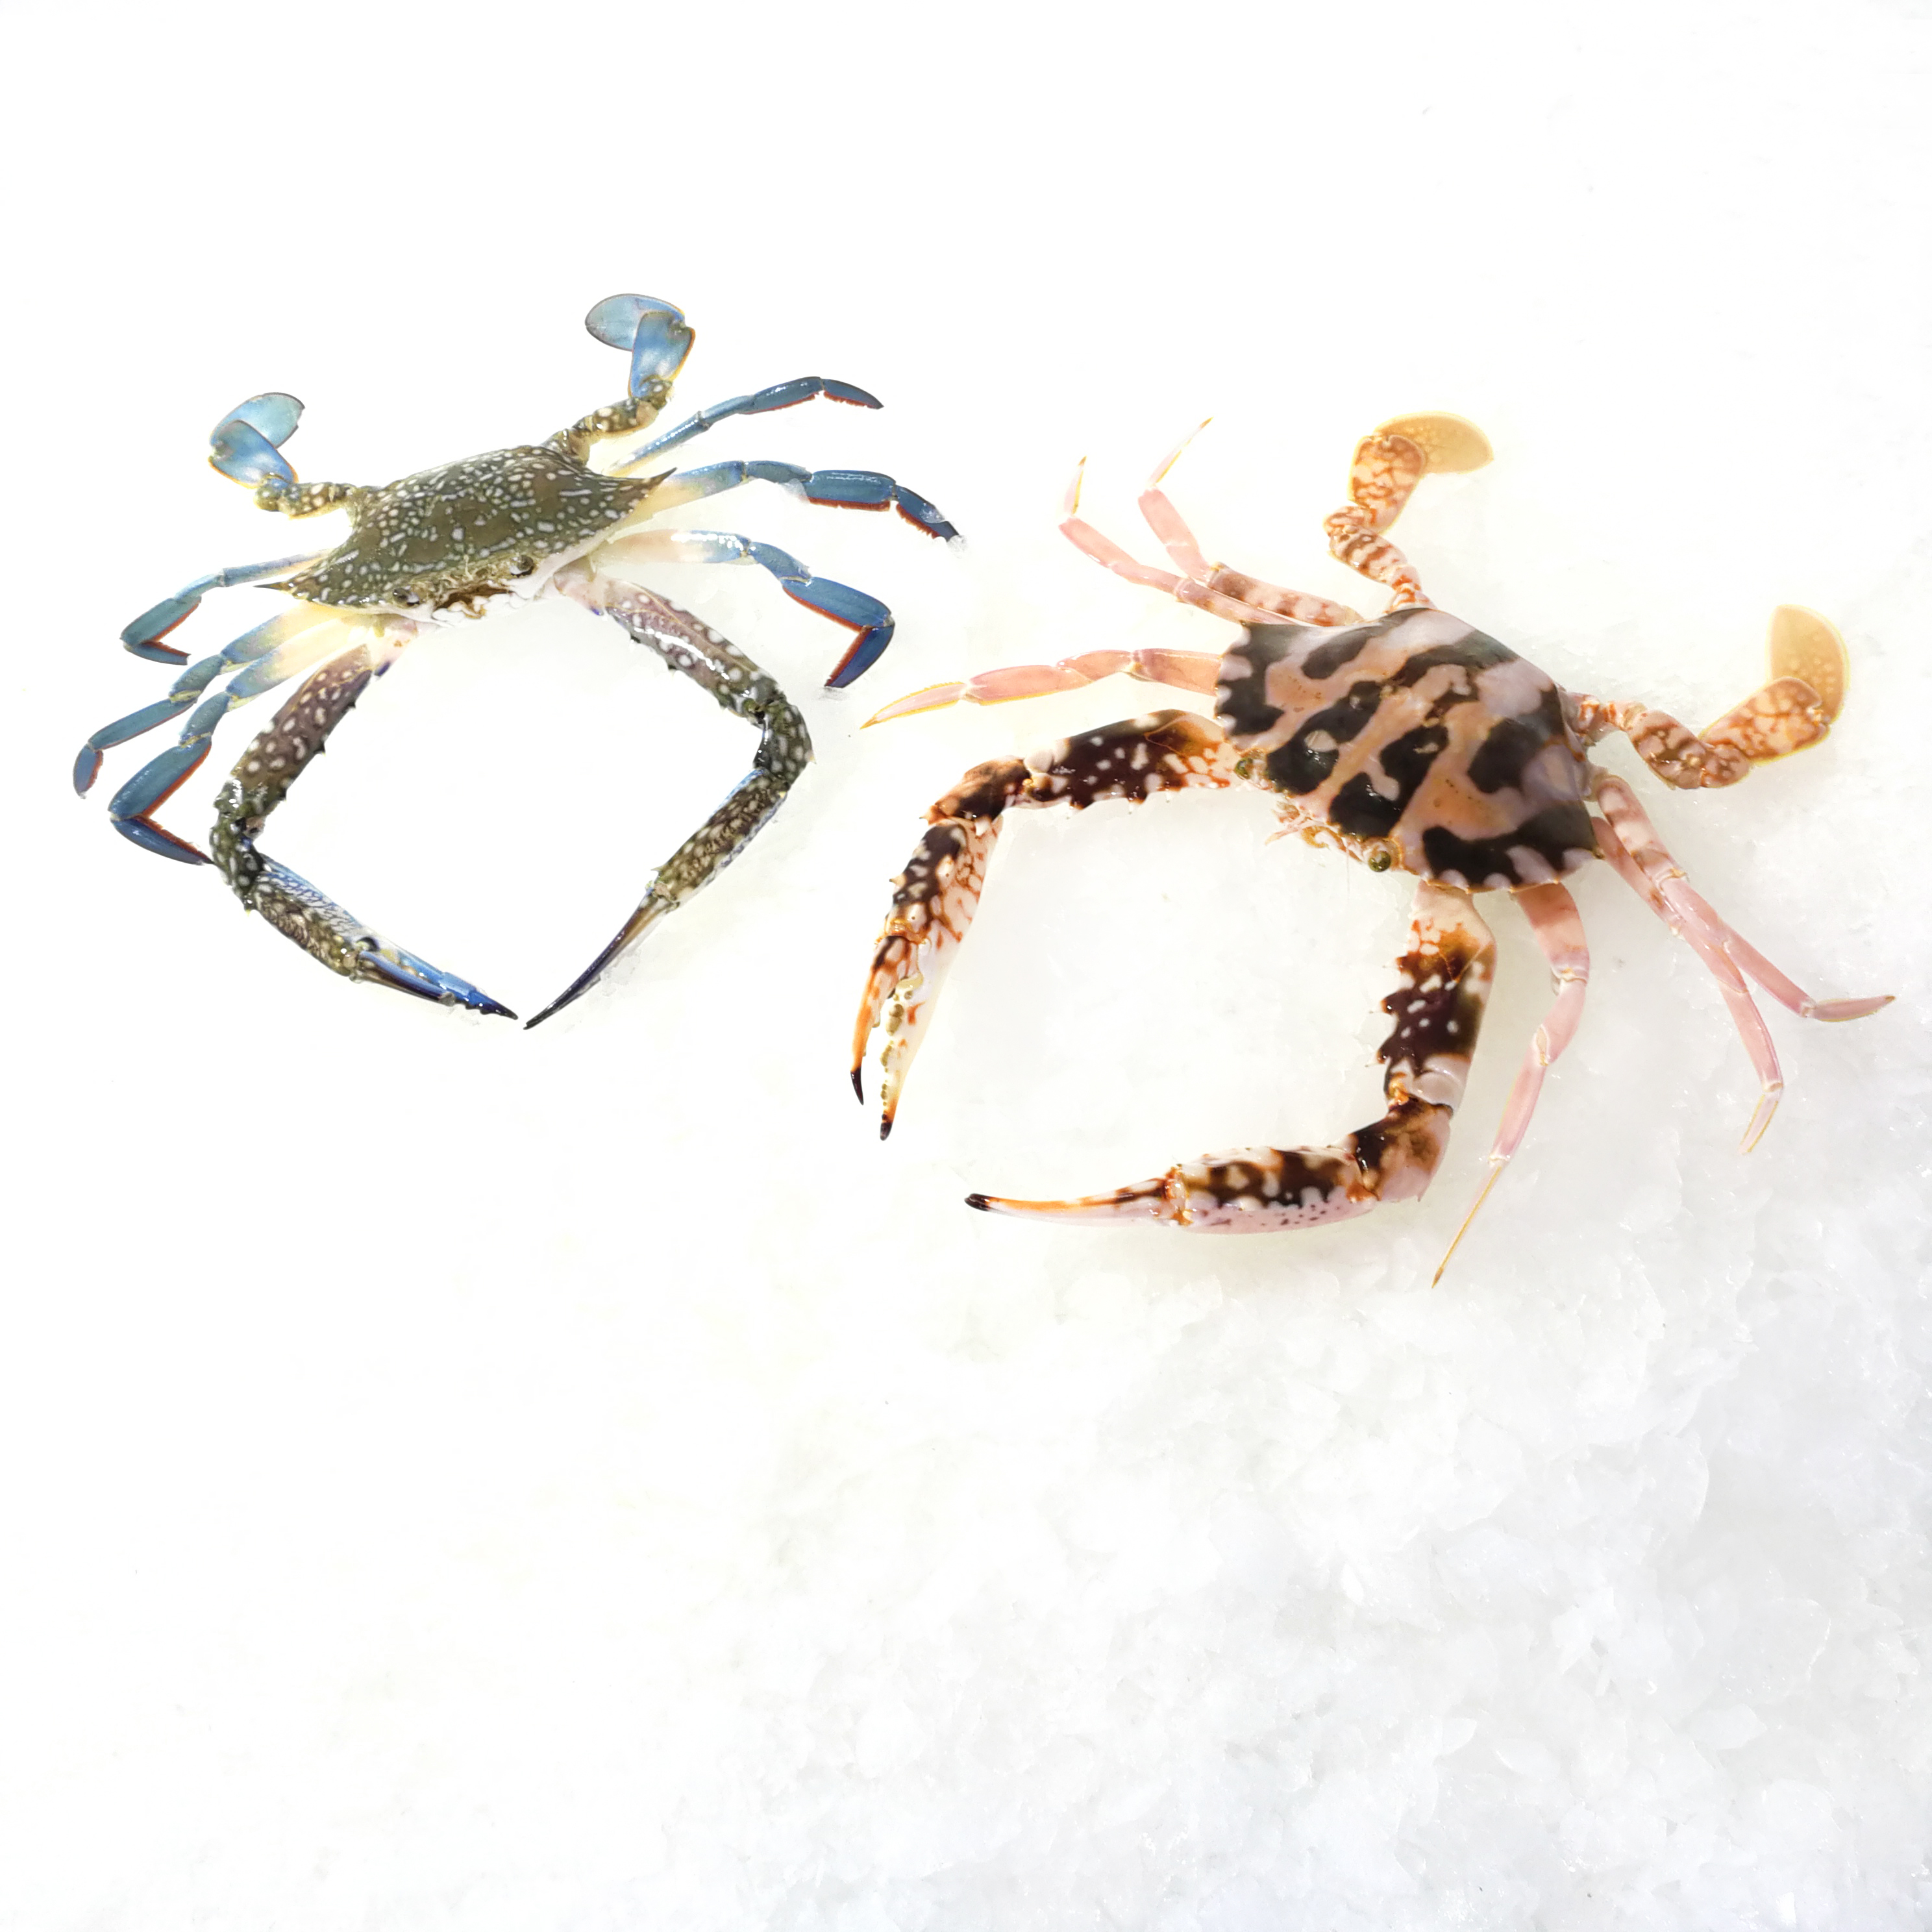 Crab Group.jpg